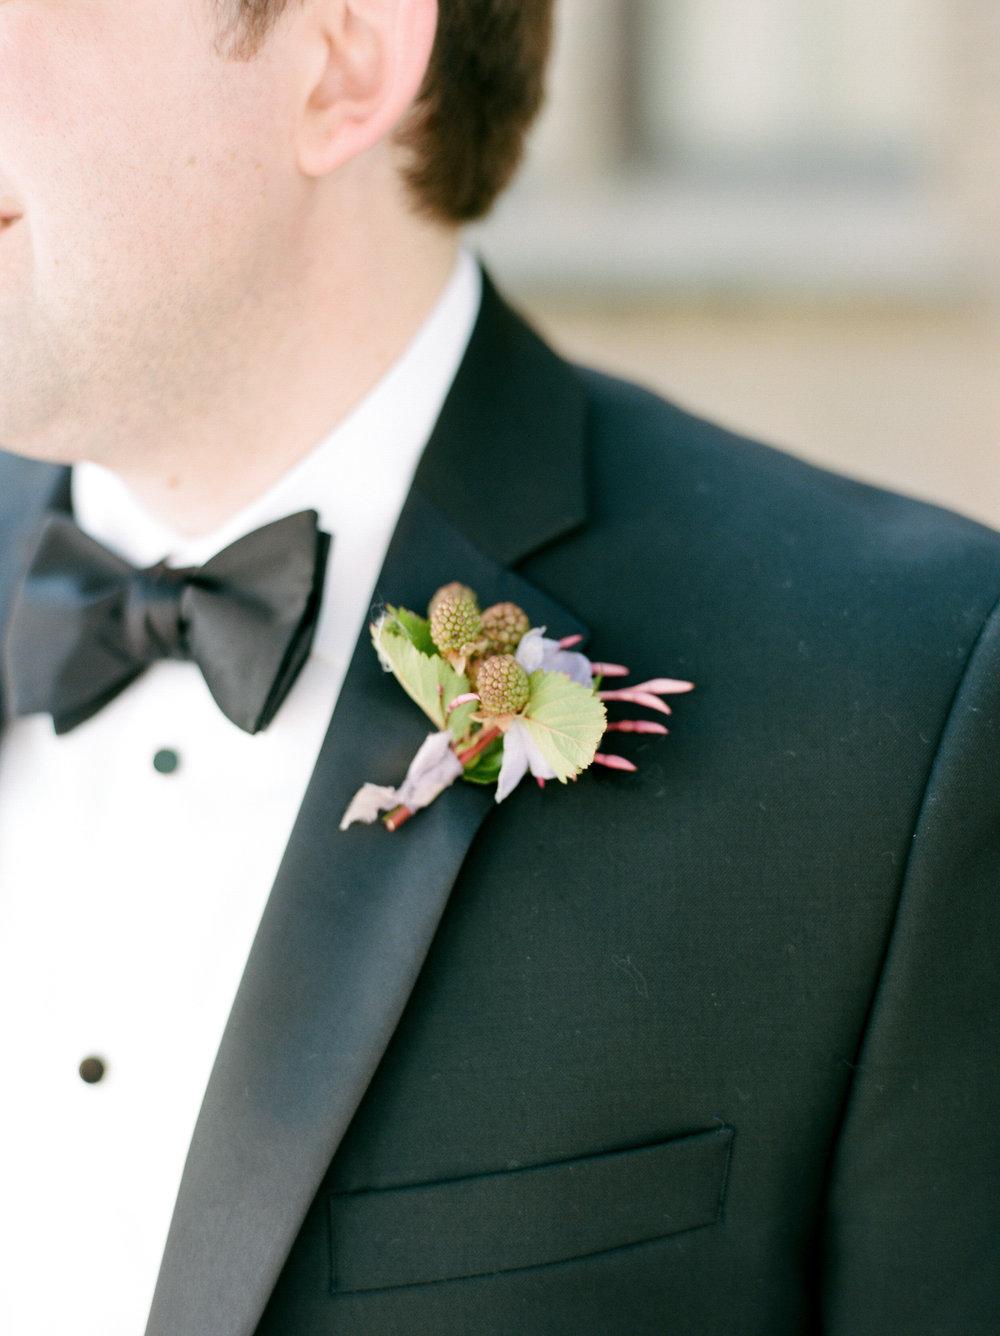 The-Knot-Texas-Fine-Art-Wedding-Film-Destination-Photographer-Houston-Austin-Dallas-New-Orleans-Julia-Ideson-Library-Event-Dana-Josh-Fernandez-Photograph-Top-Best-36.jpg